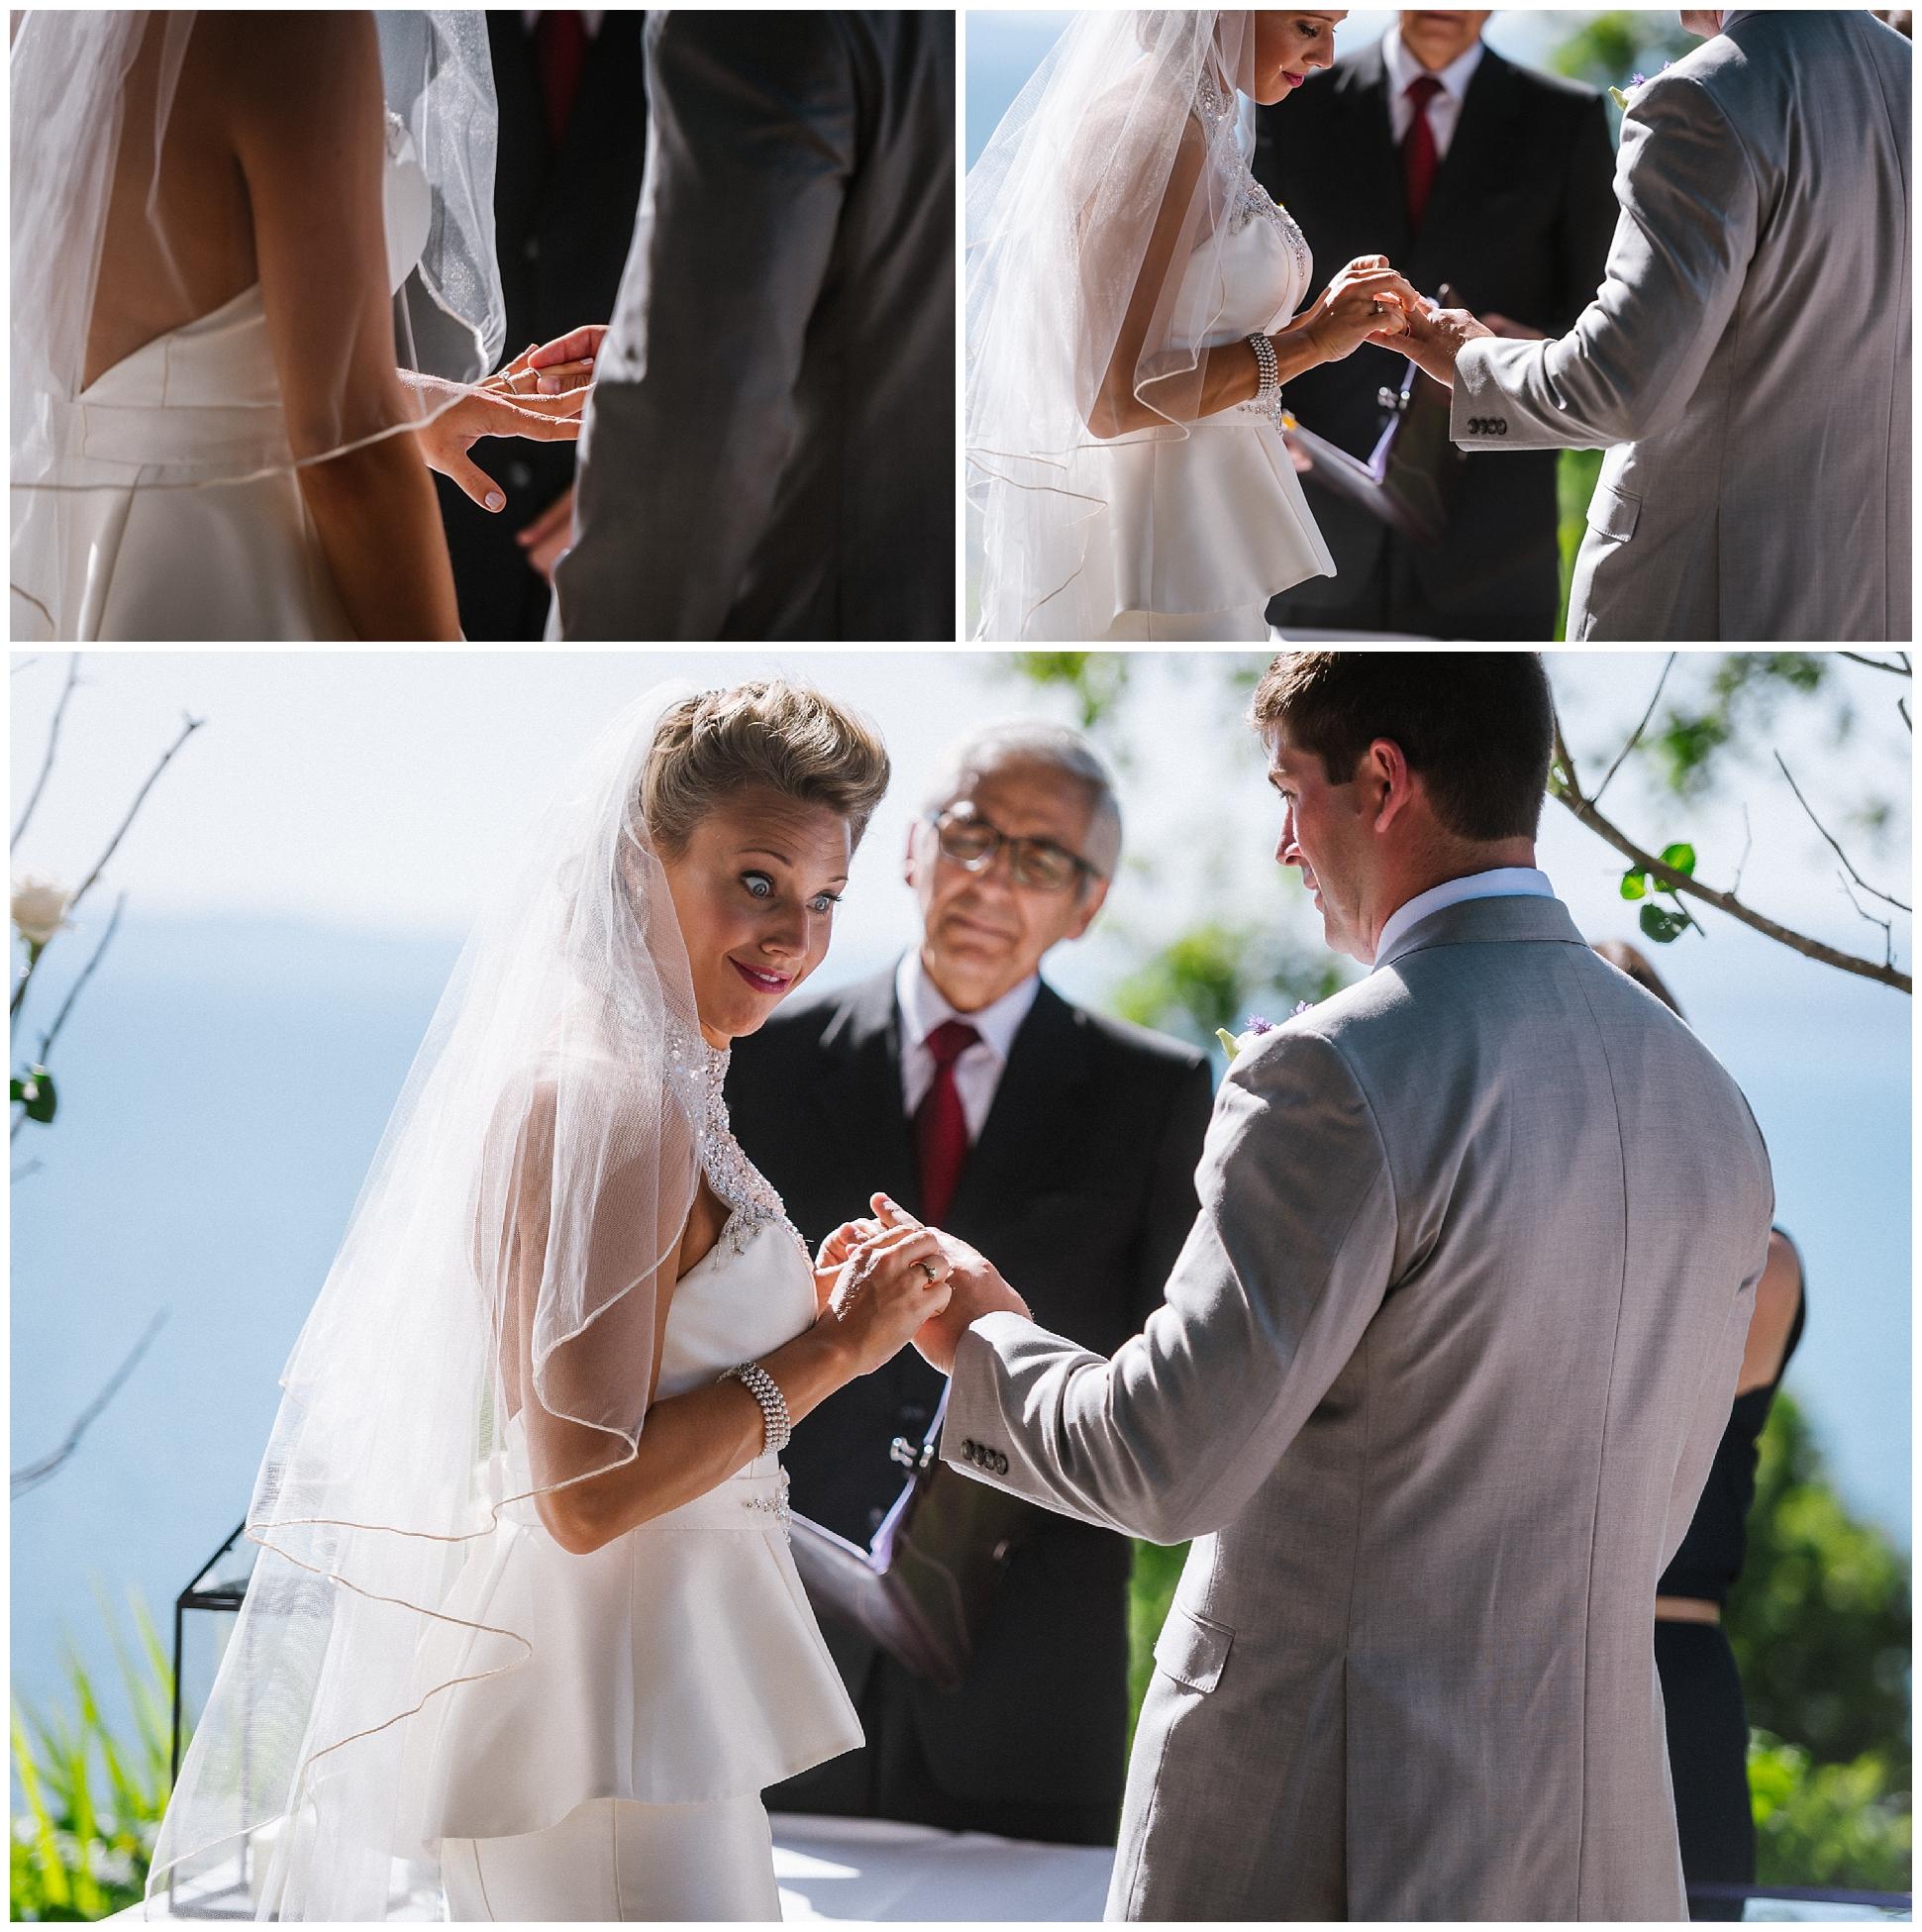 Cheilean-destination-adventure-wedding-florida-patagonia-pucon-santa-cruz-vsco_0098.jpg